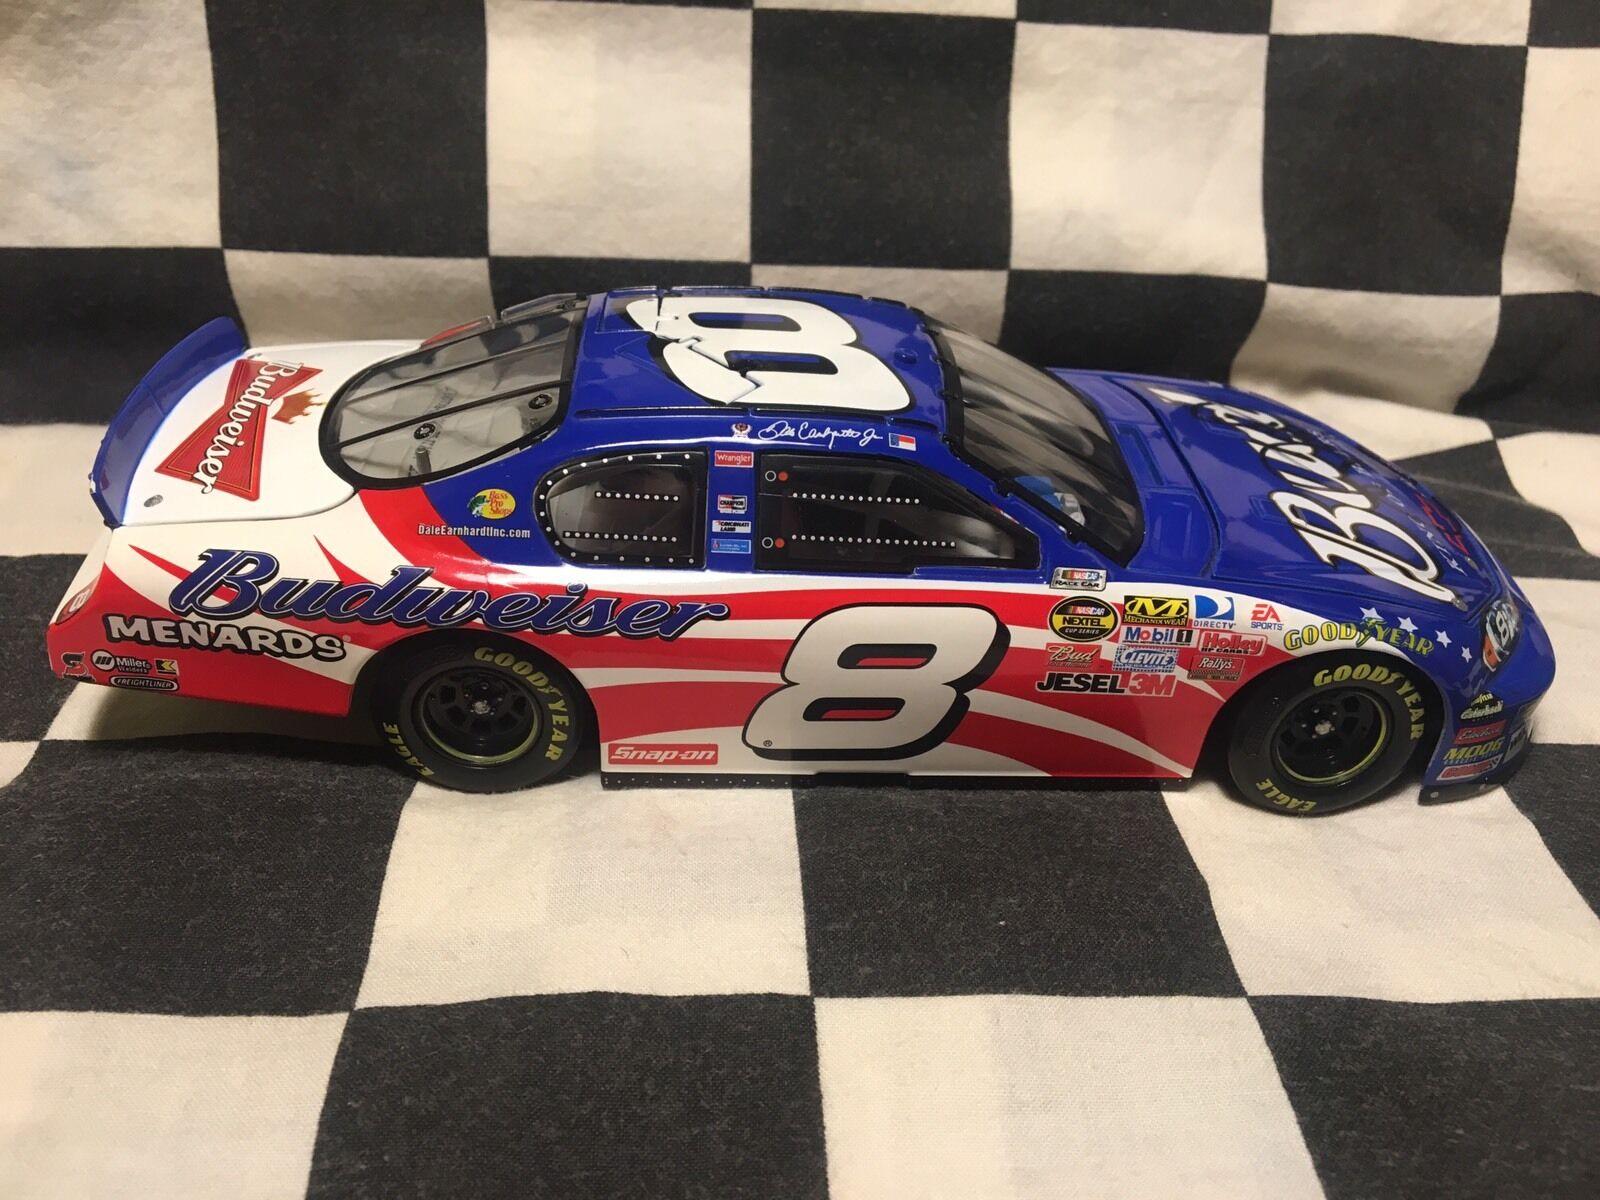 2007 Dale Earnhardt Jr 1 24 diecast diecast diecast Budweiser Stars & Stripes Autograph 80da44